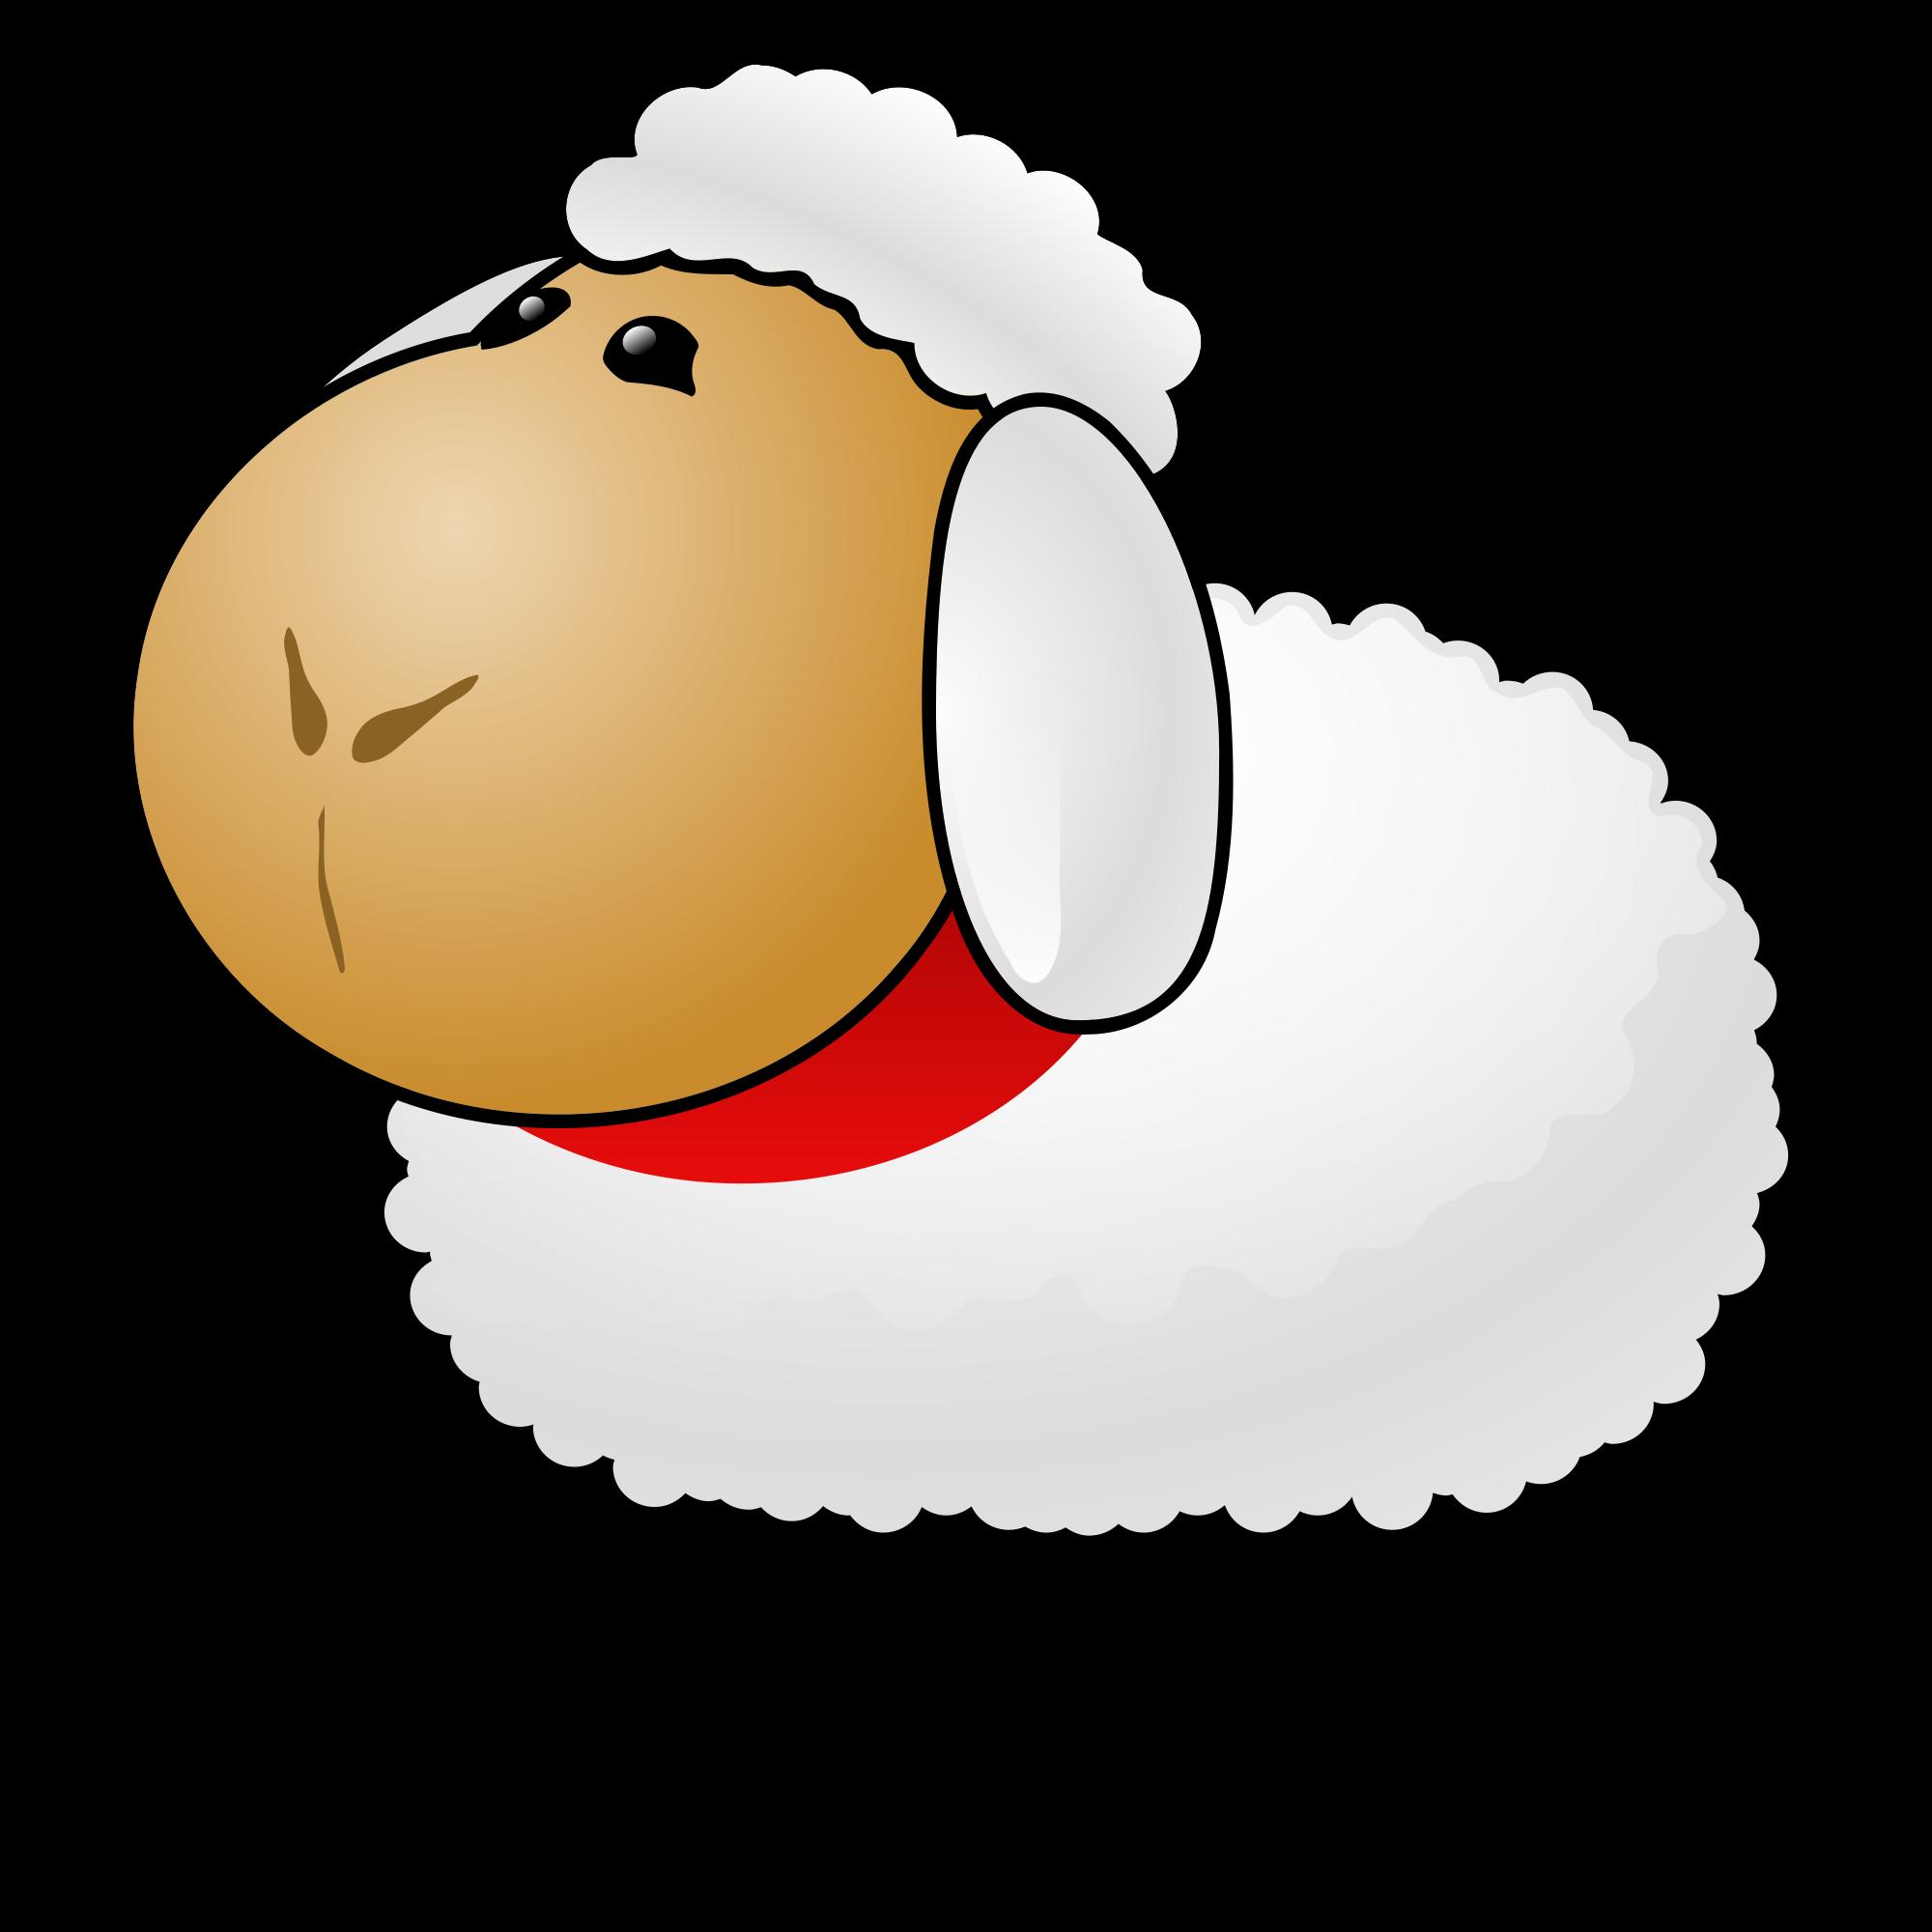 Cartoon sheep images group. Lamb clipart svg